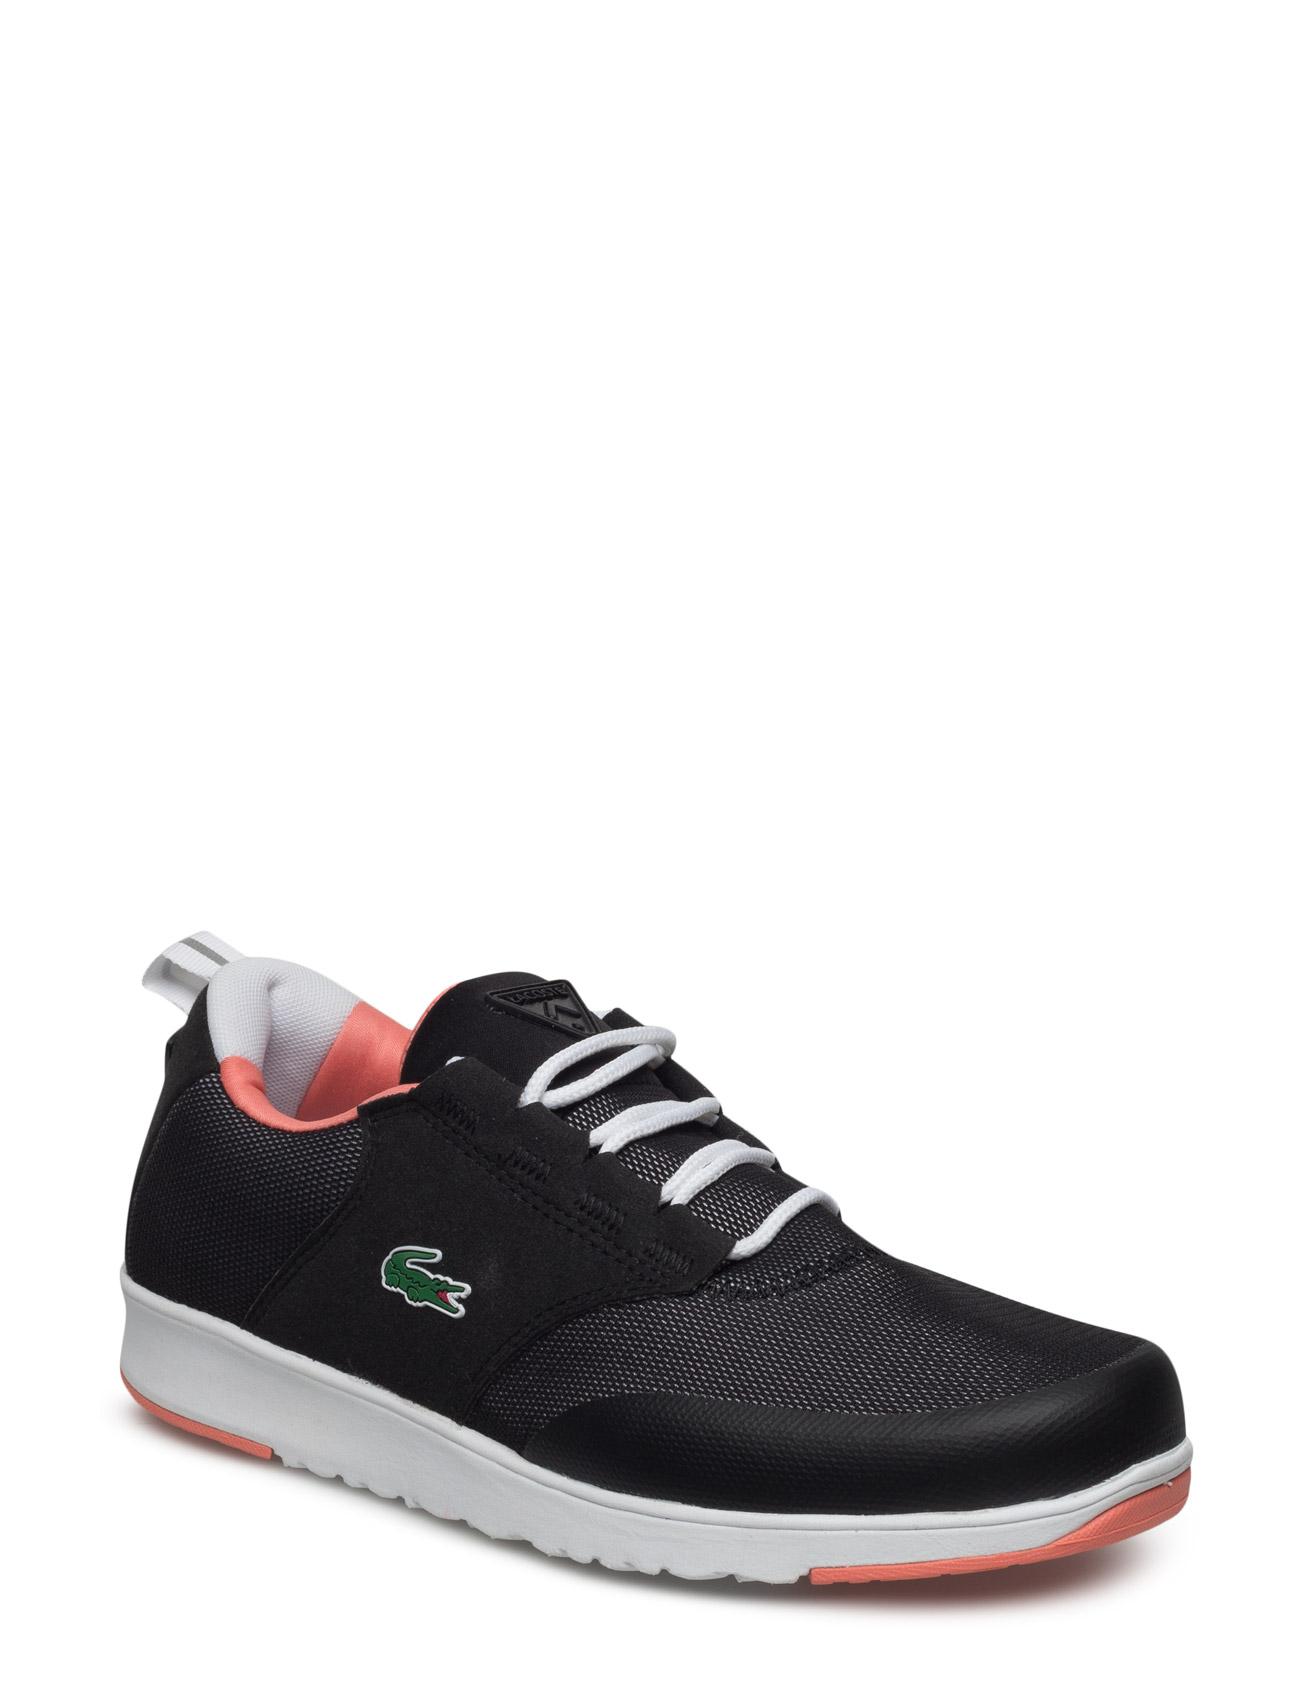 L.Ight R 117 1 Lacoste Shoes Sneakers til Damer i